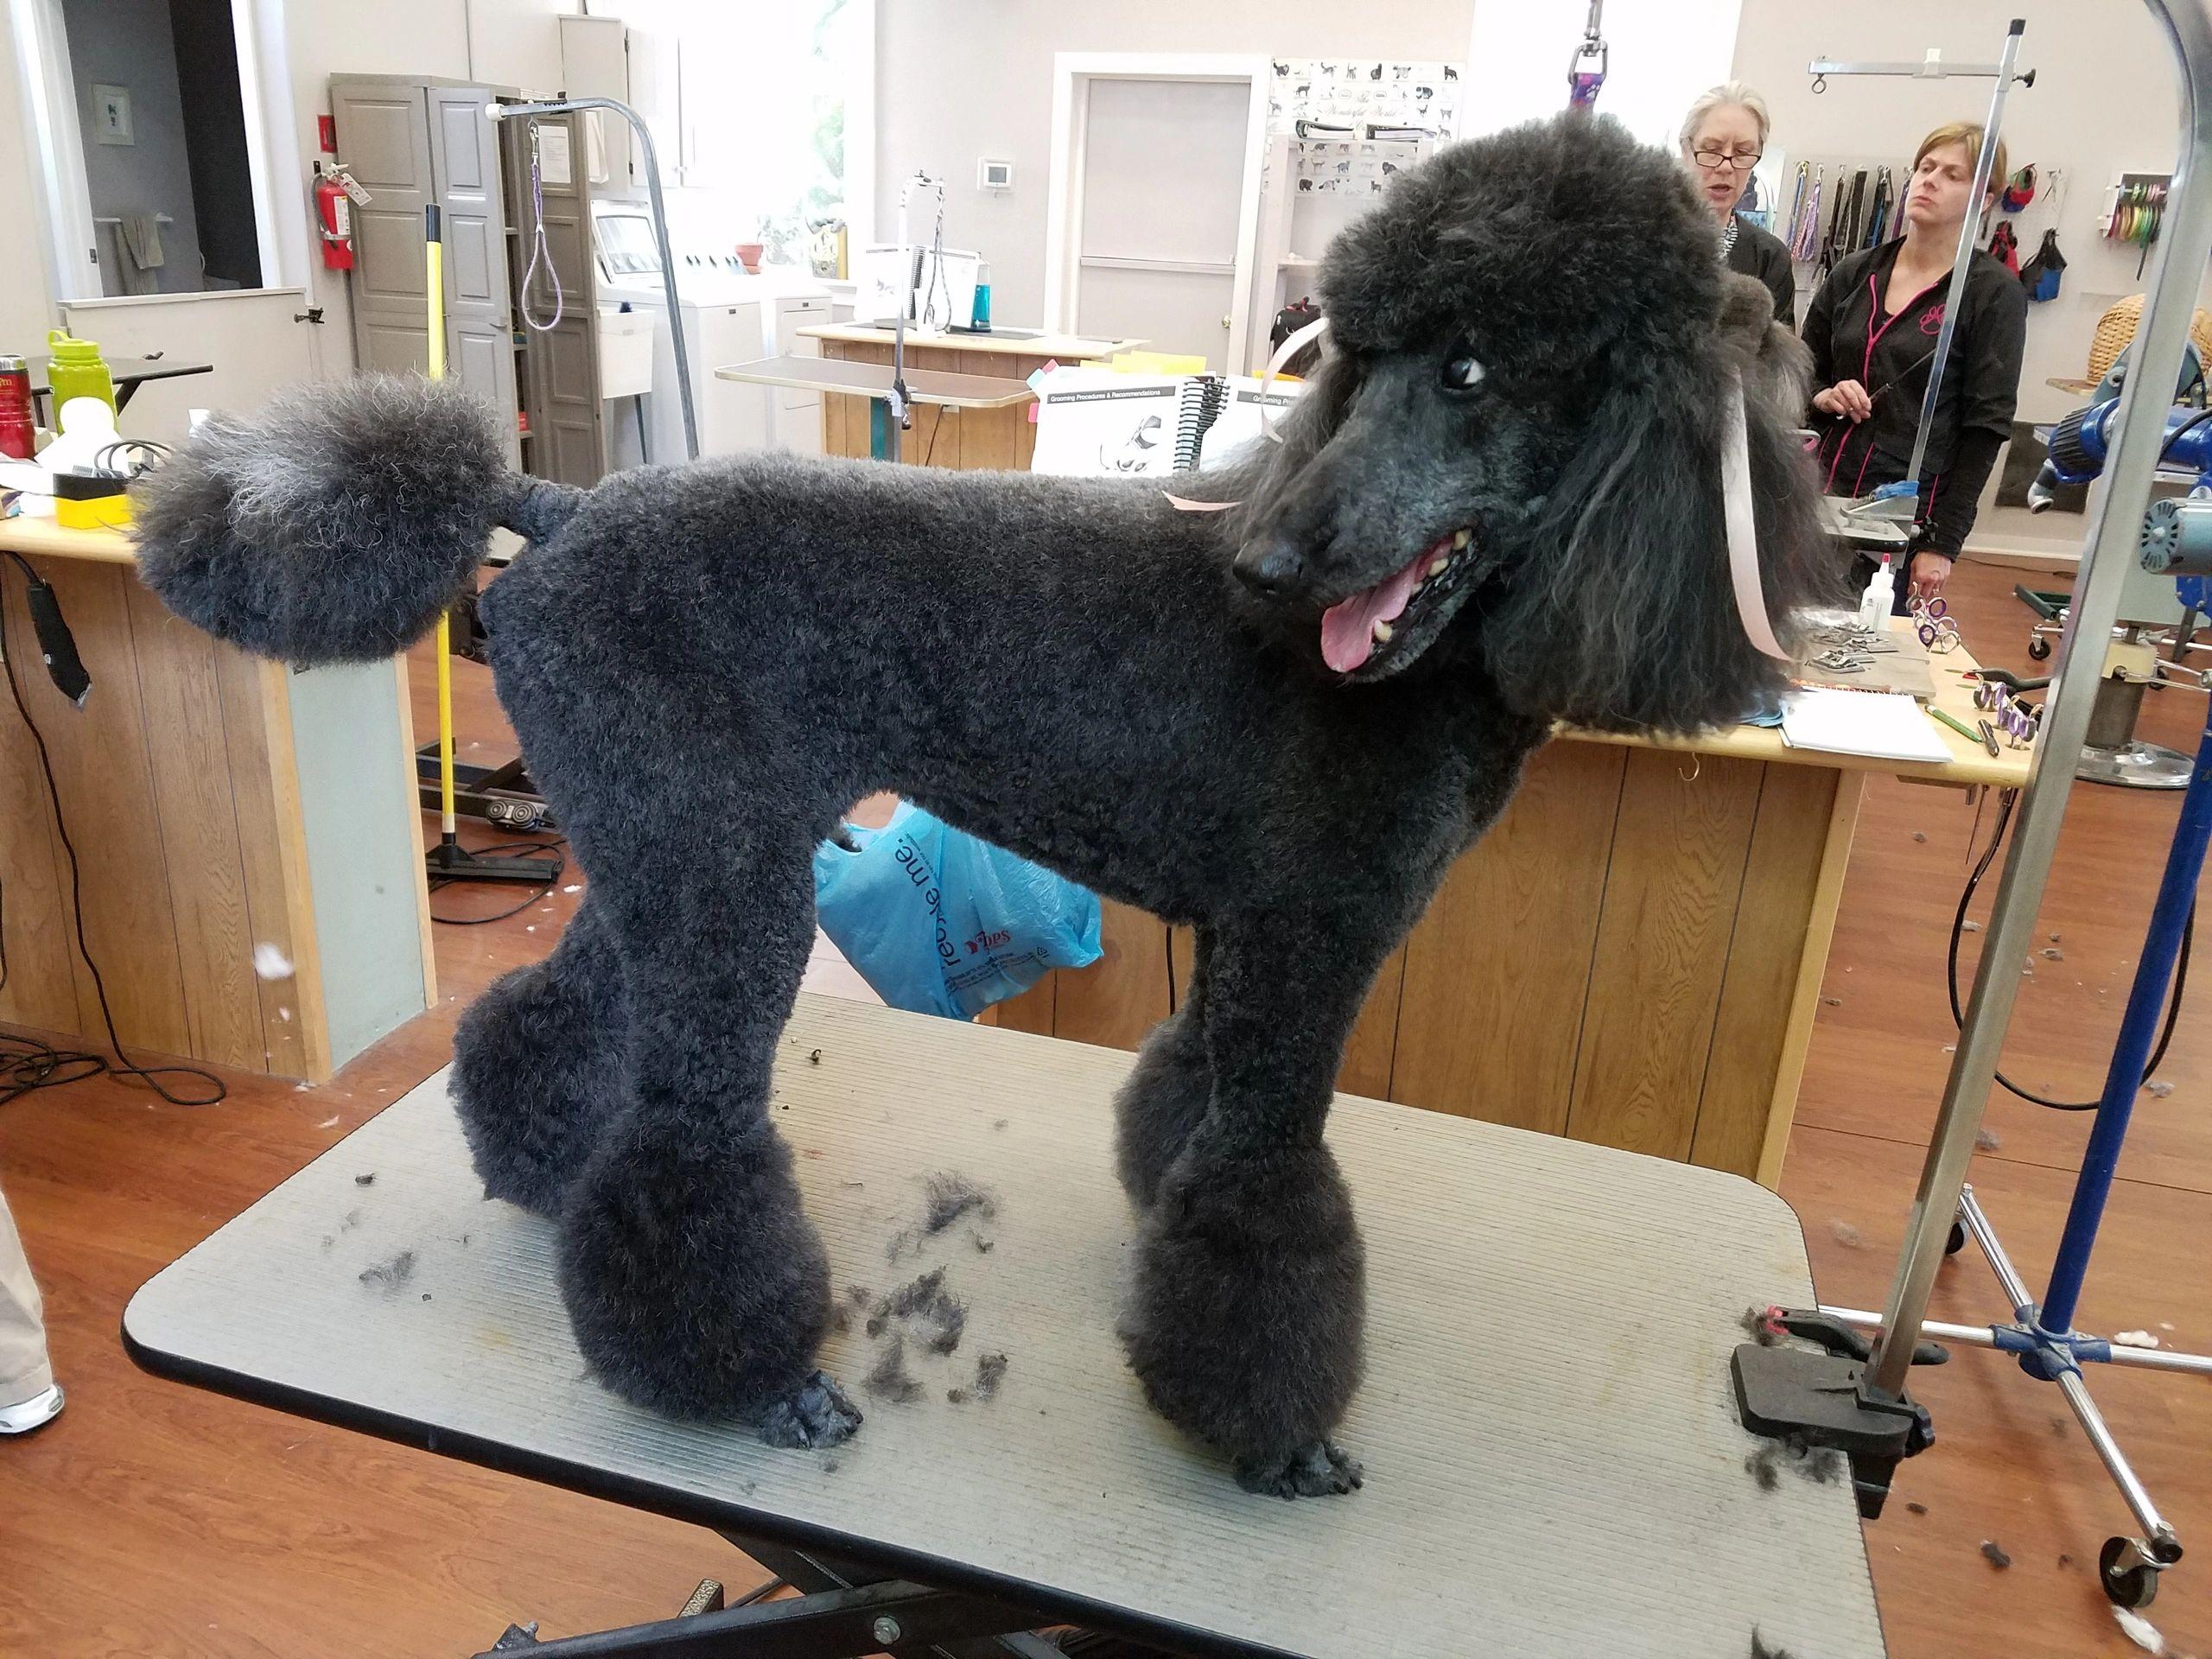 Dog groomer the dog groomer llc clinton missouri solutioingenieria Gallery